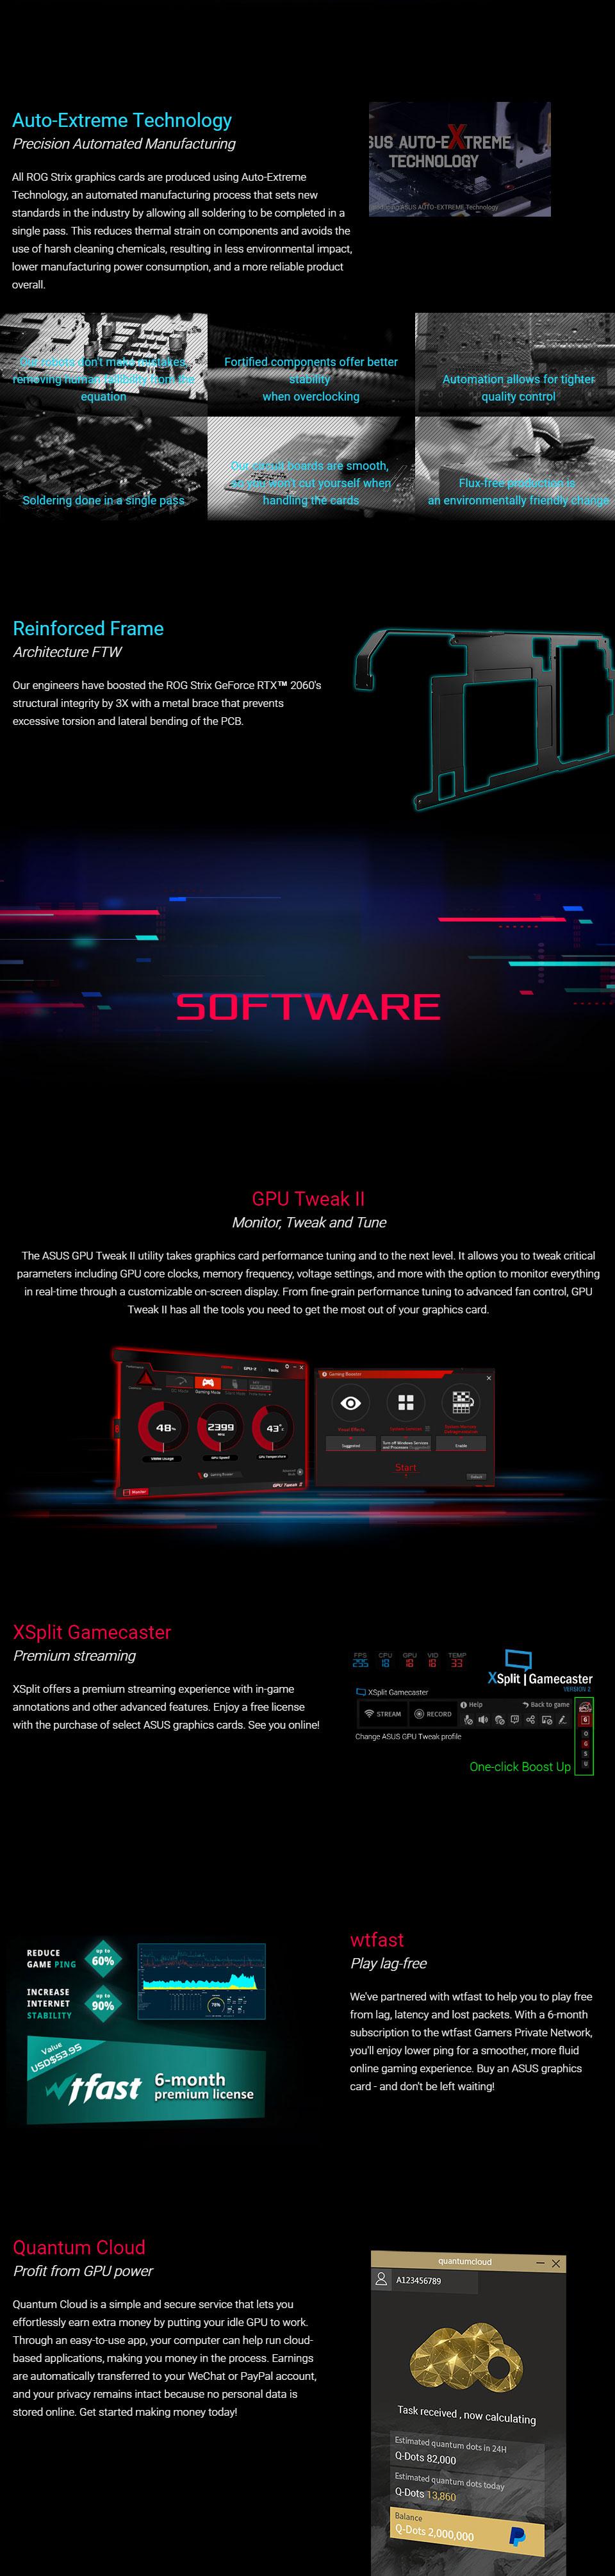 Asus RTX2060 Strix OC 6G